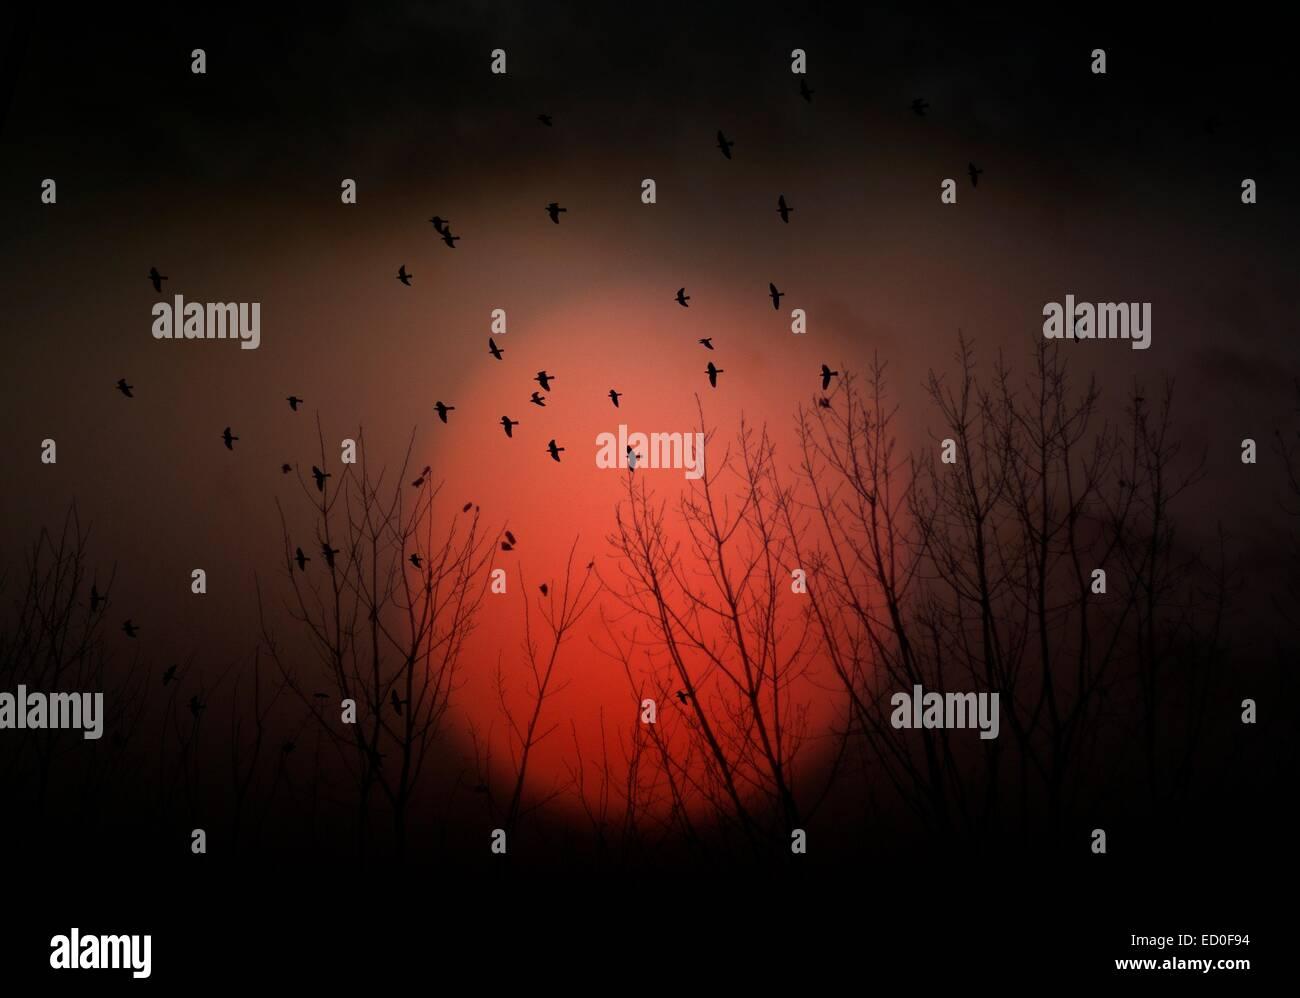 Spain, Madrid, Silhouette of birds - Stock Image